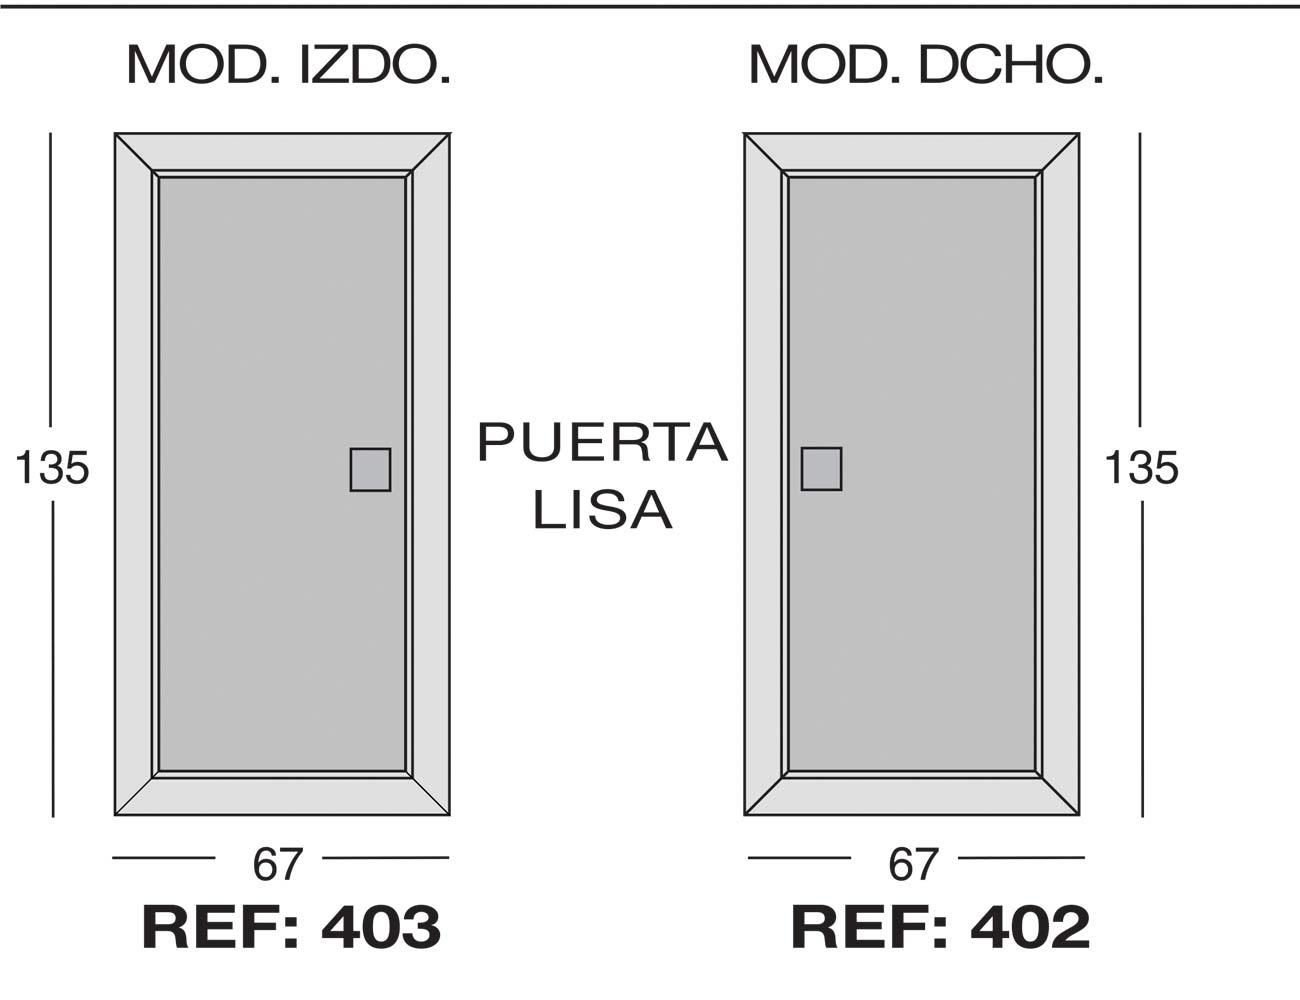 Modulo izdo 403 dcho 402